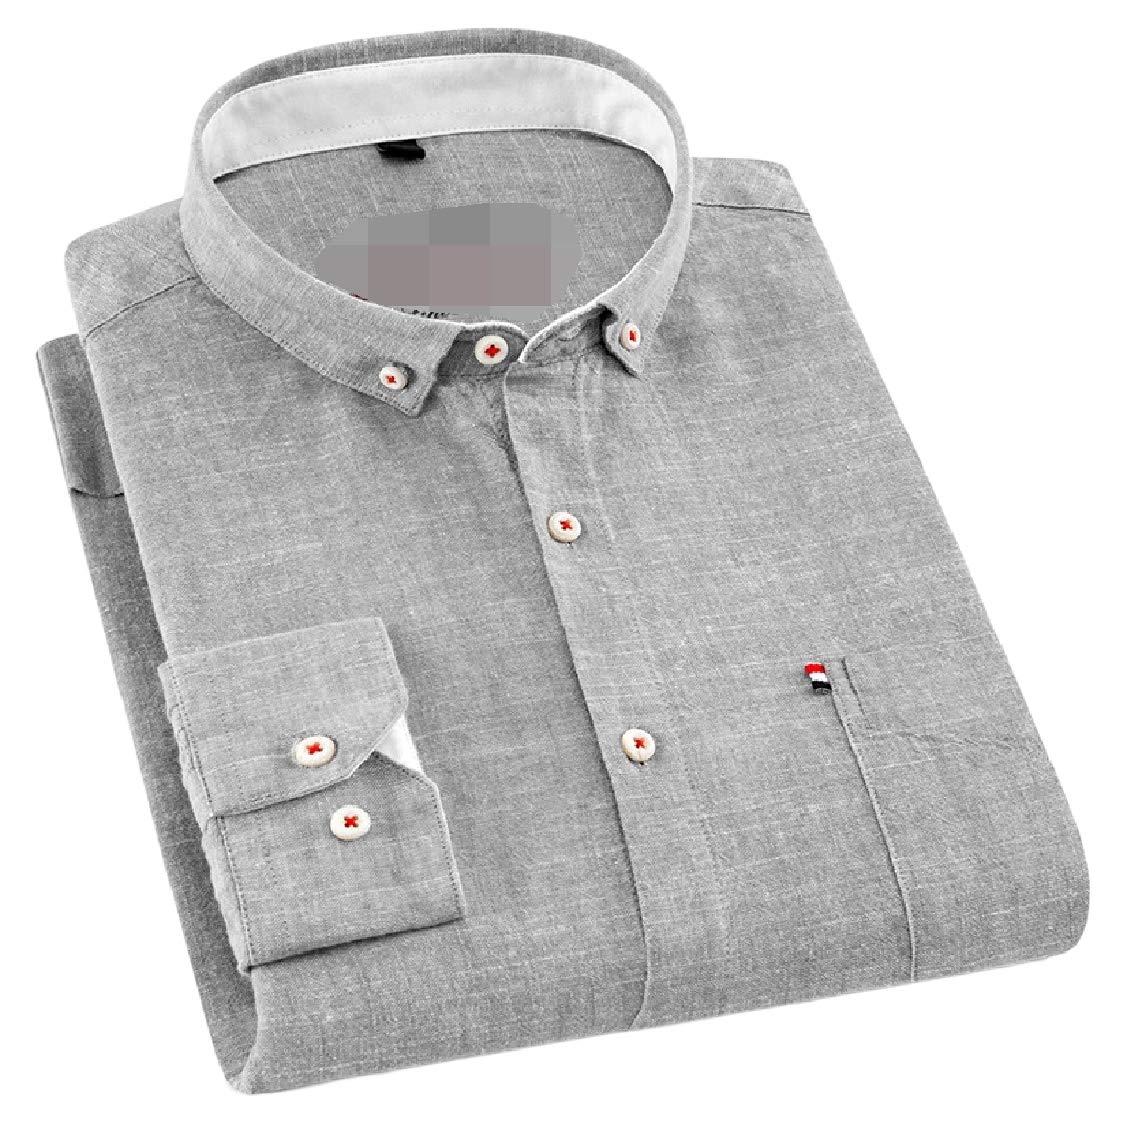 Pandapang Mens Wrinkle Free Linen Washed Casual Slim Long-Sleeve Shirt